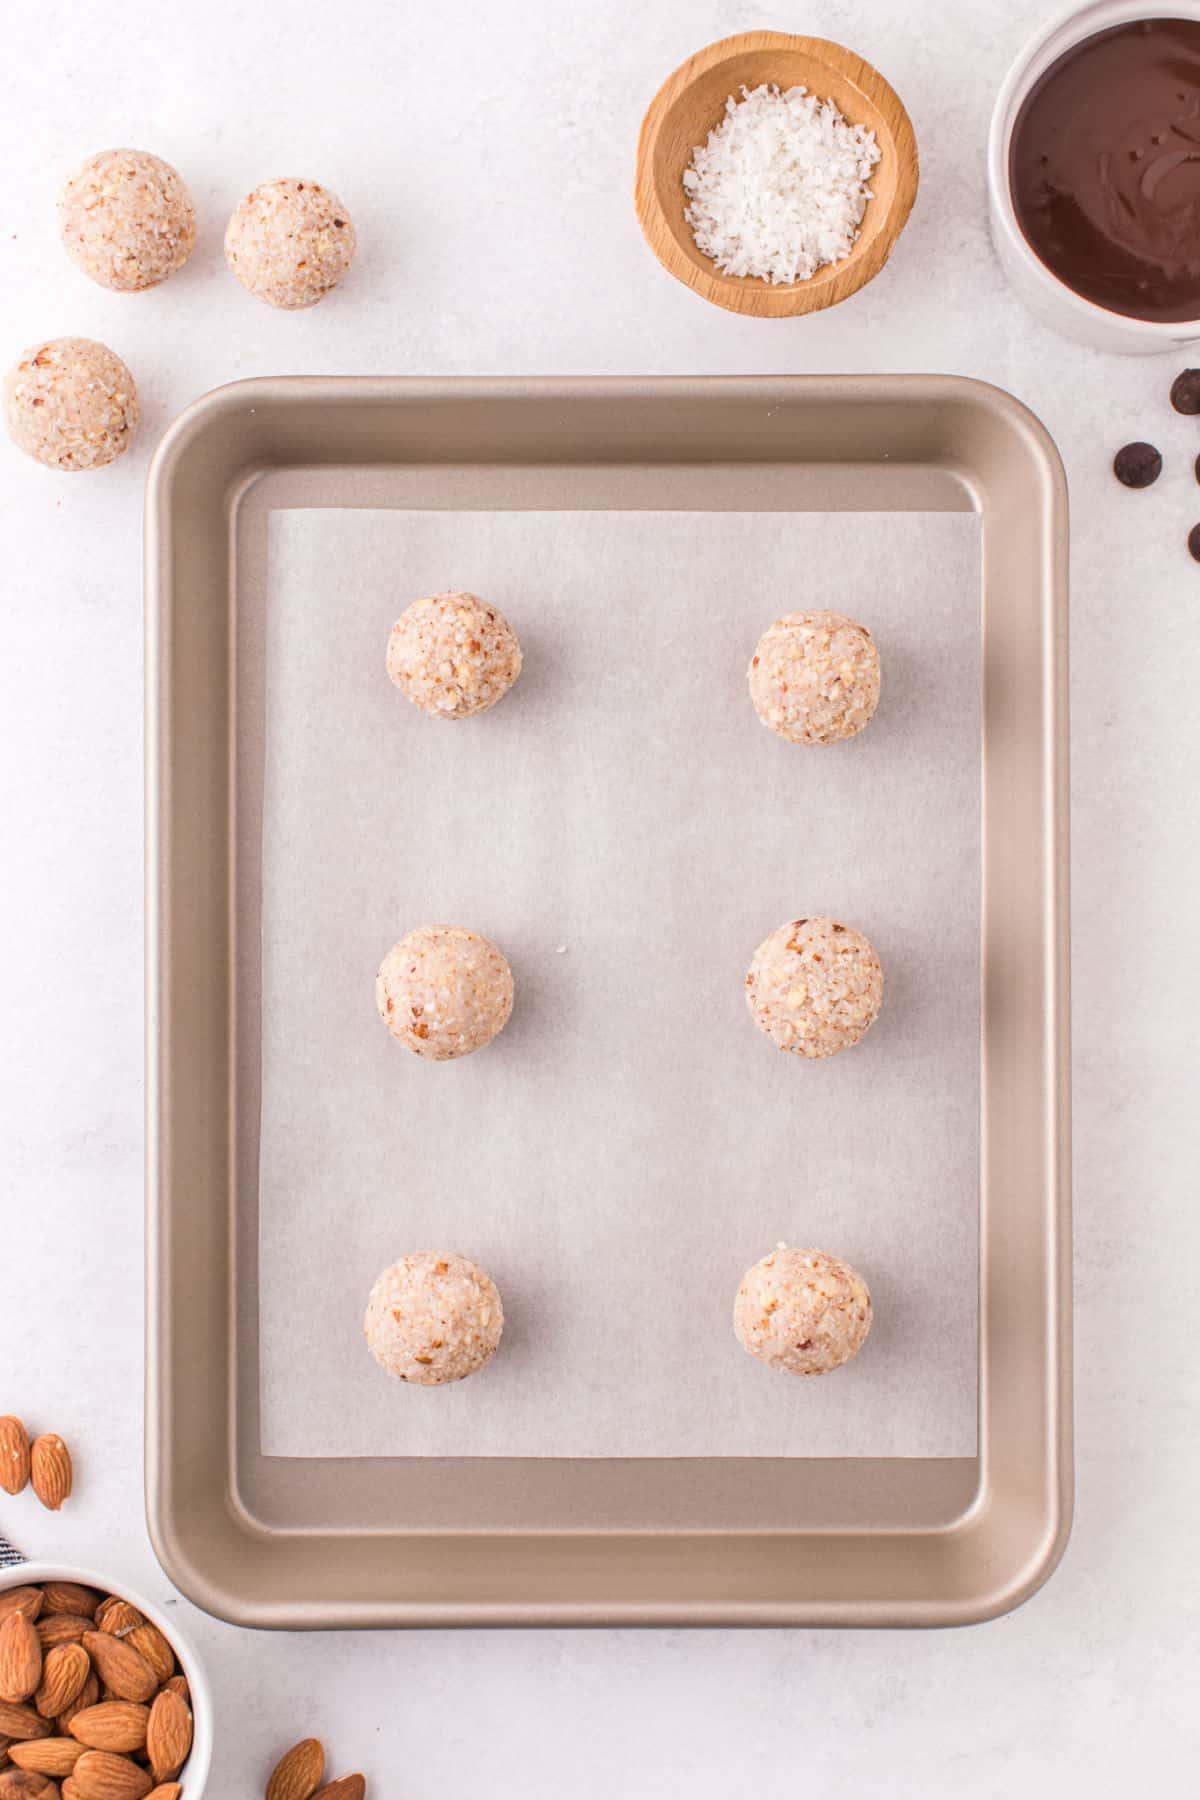 Step 3 - scoop balls